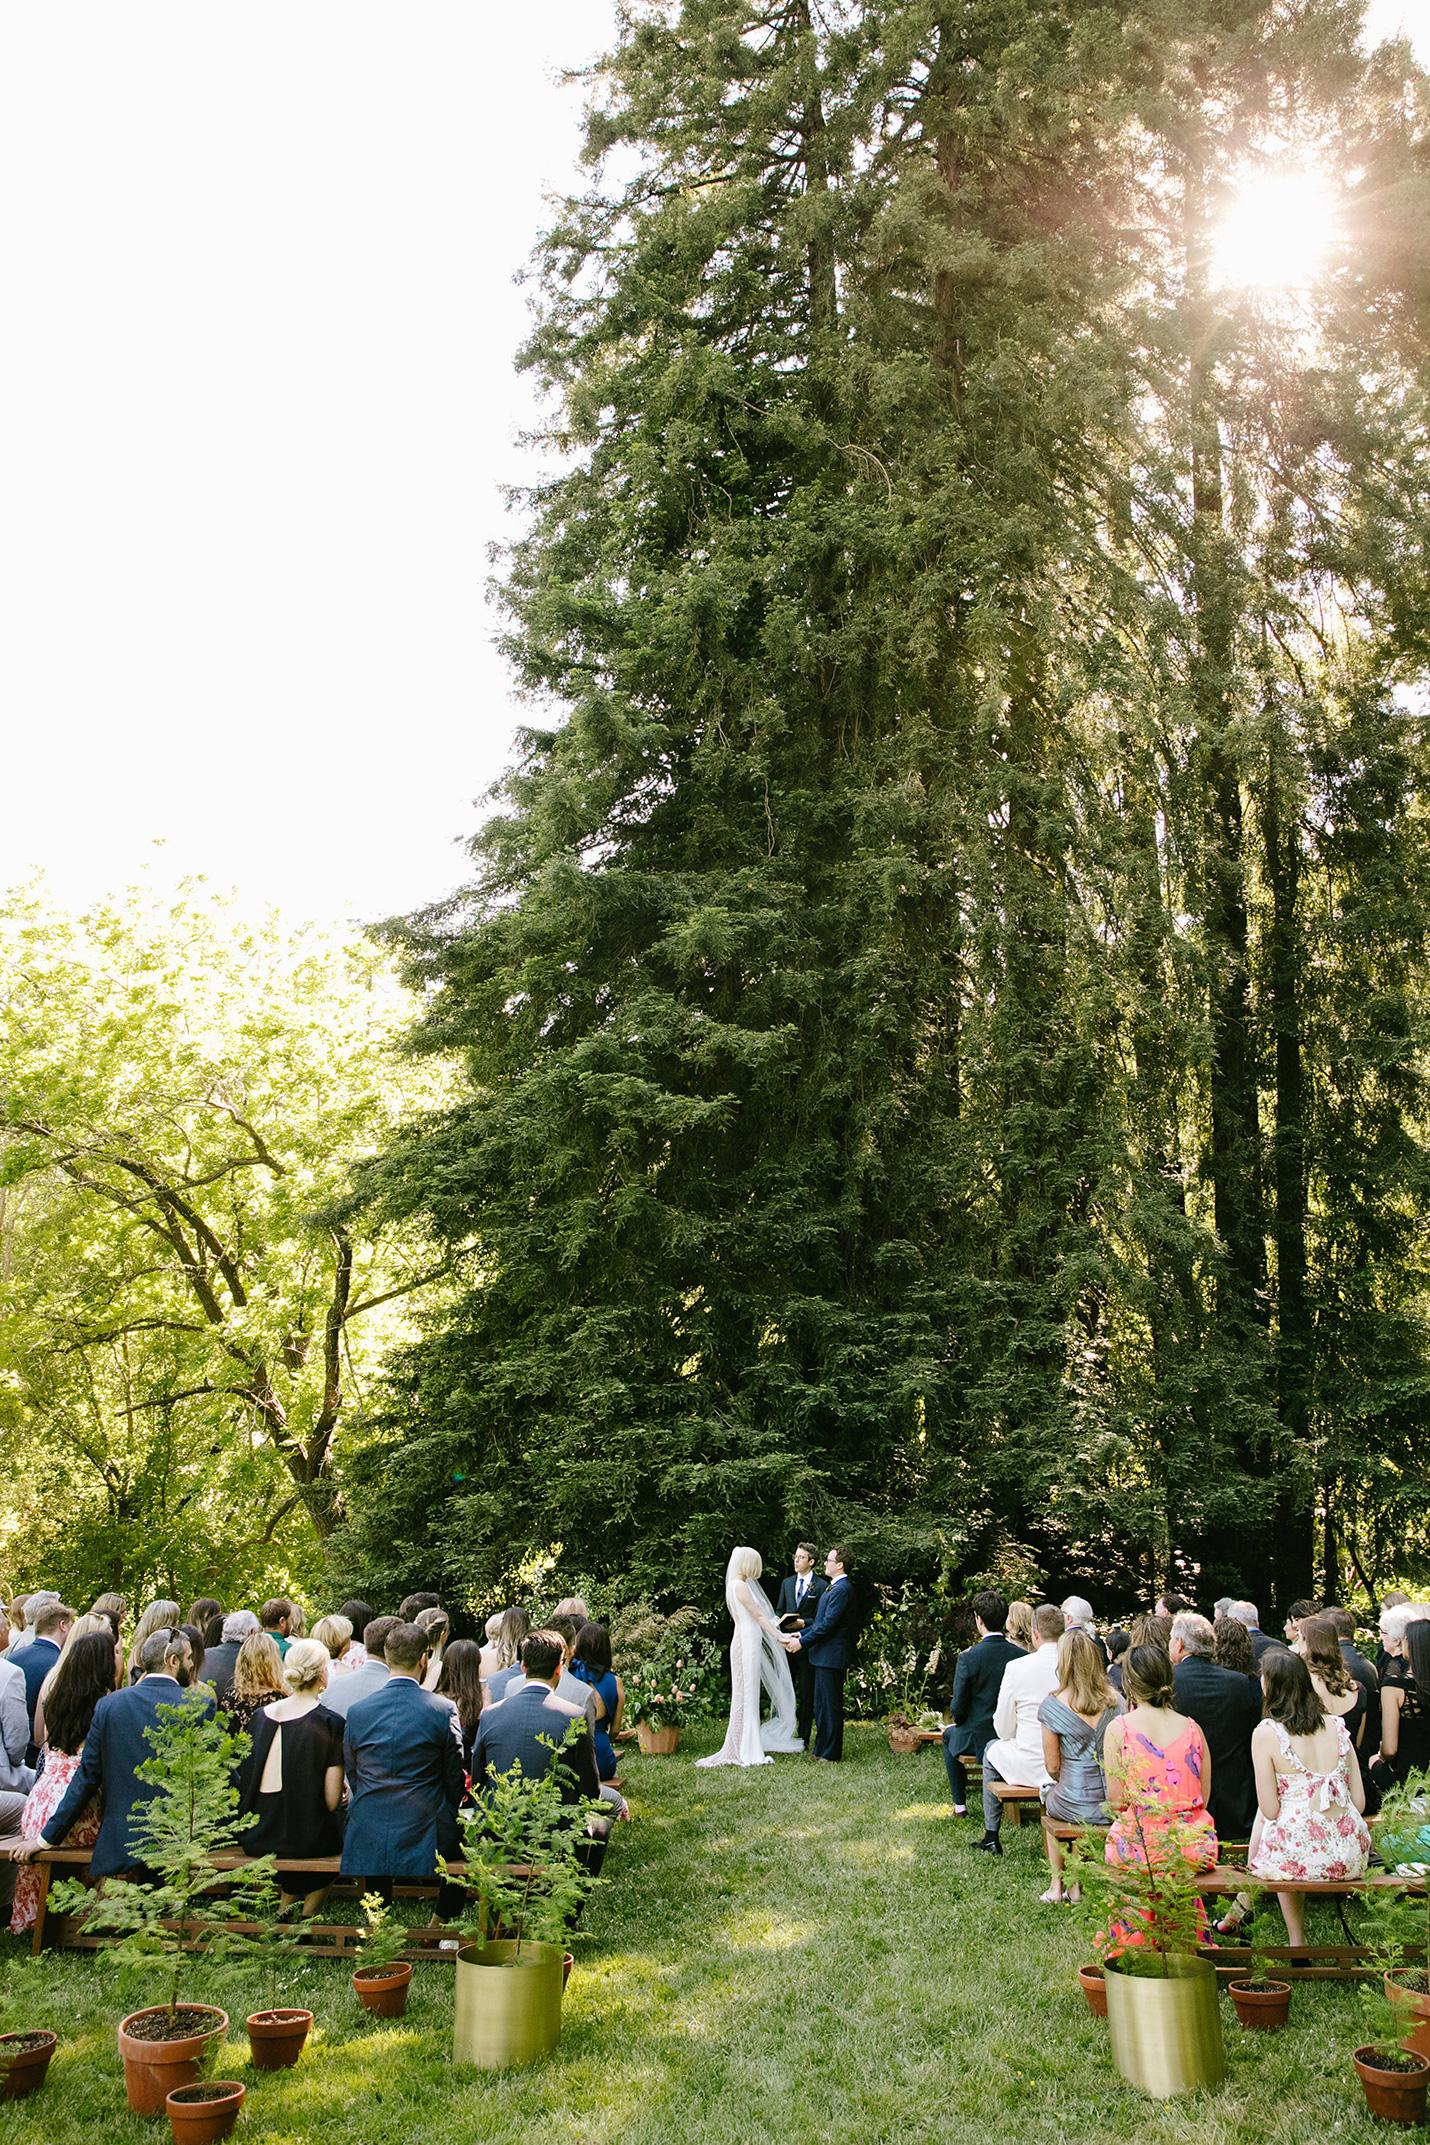 kendall jackson wedding outdoor ceremony